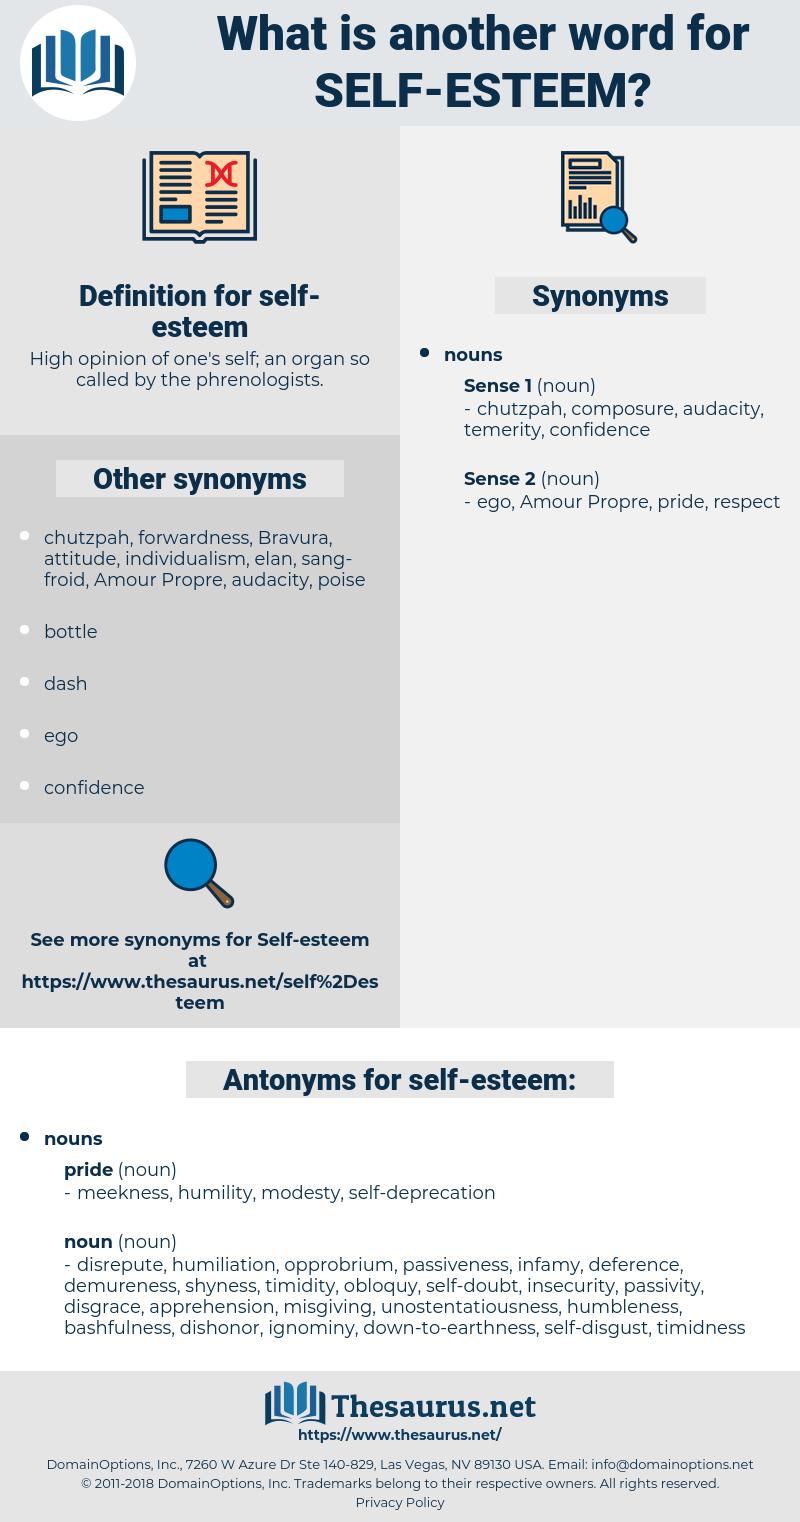 self-esteem, synonym self-esteem, another word for self-esteem, words like self-esteem, thesaurus self-esteem